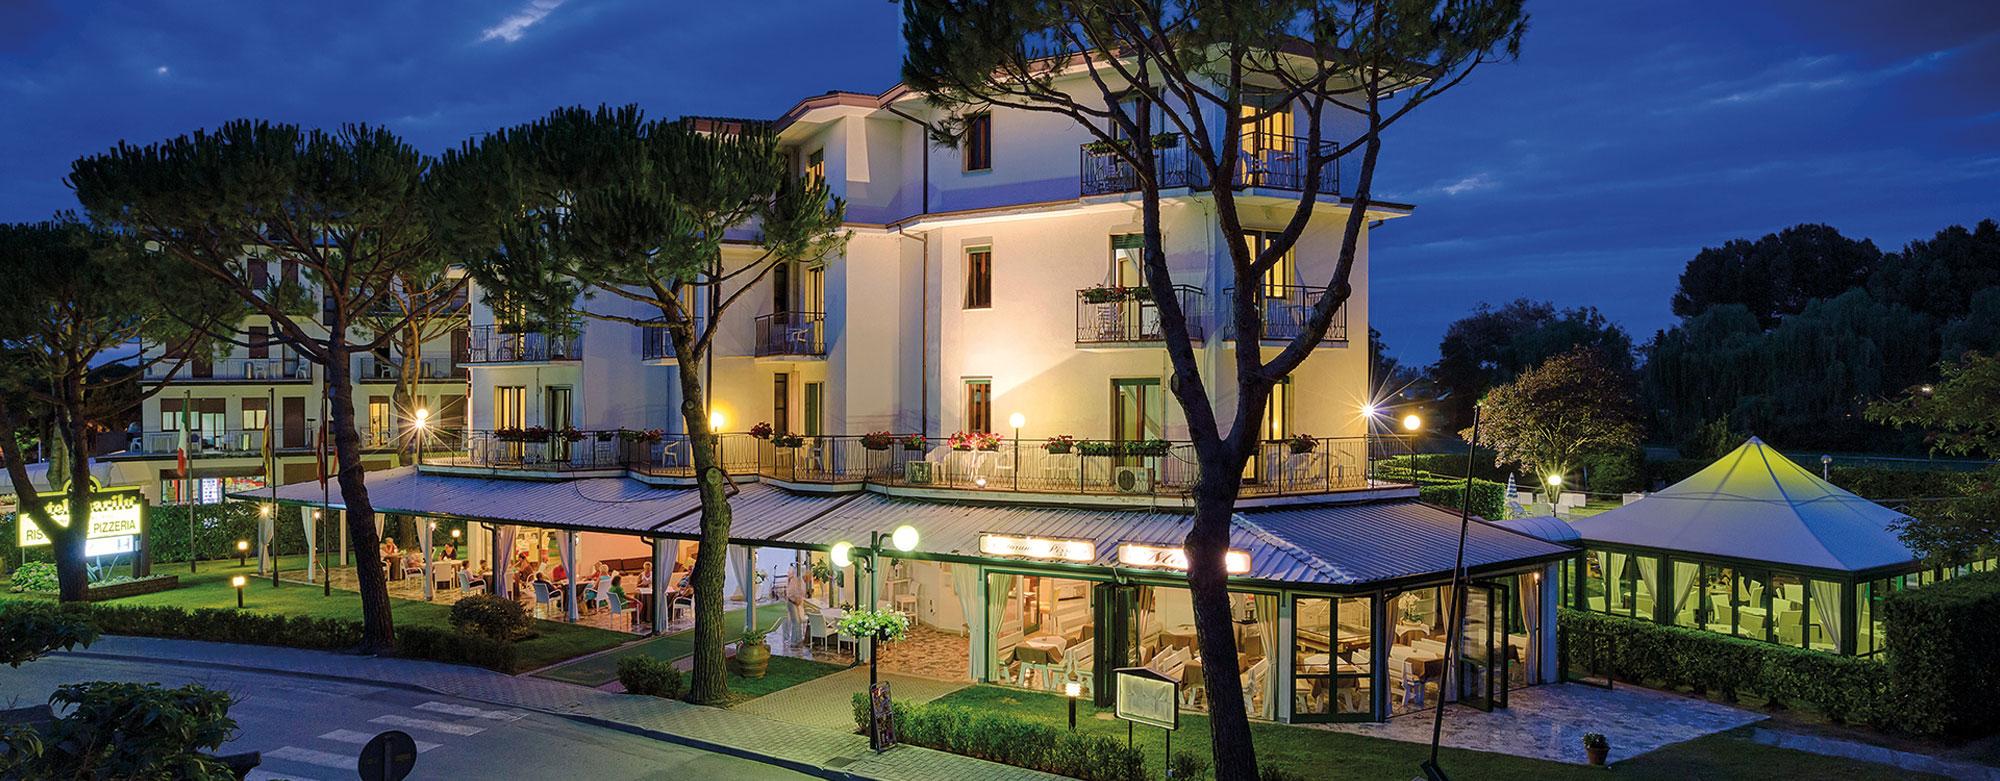 Hotel Marilù Eraclea Mare